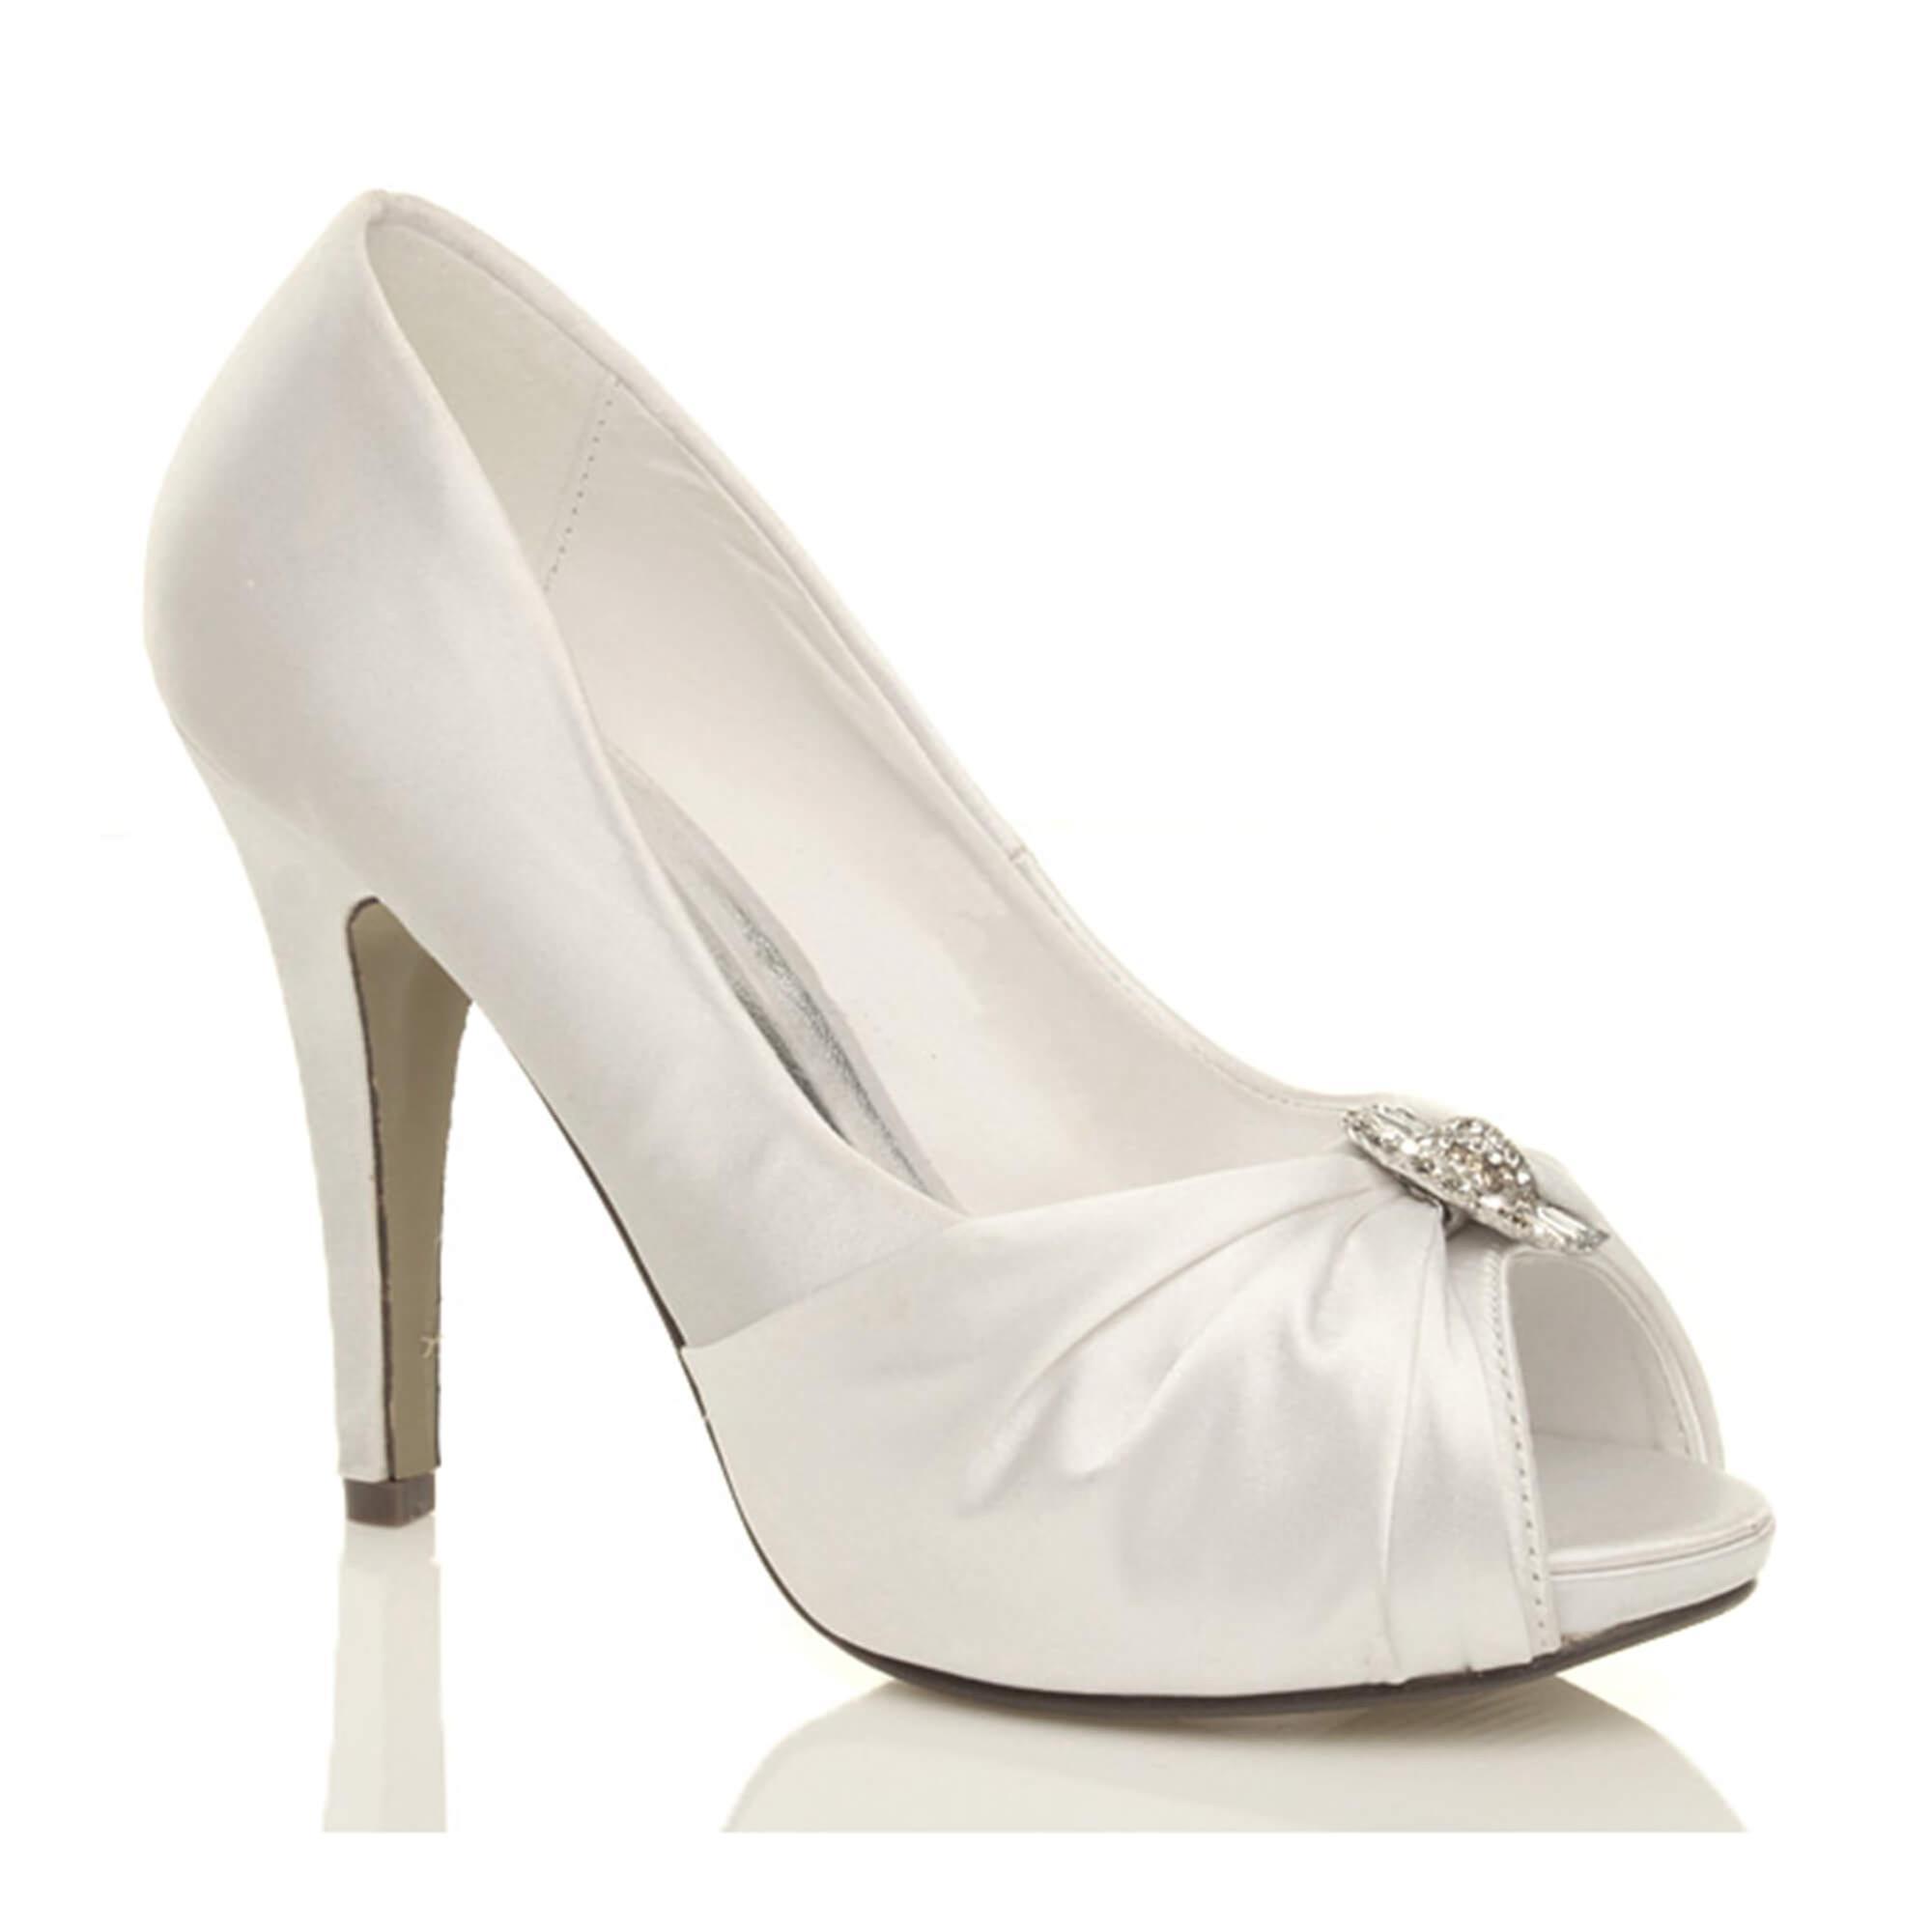 Ajvani womens high heel platform wedding prom bridal party court peep toe shoes pumps